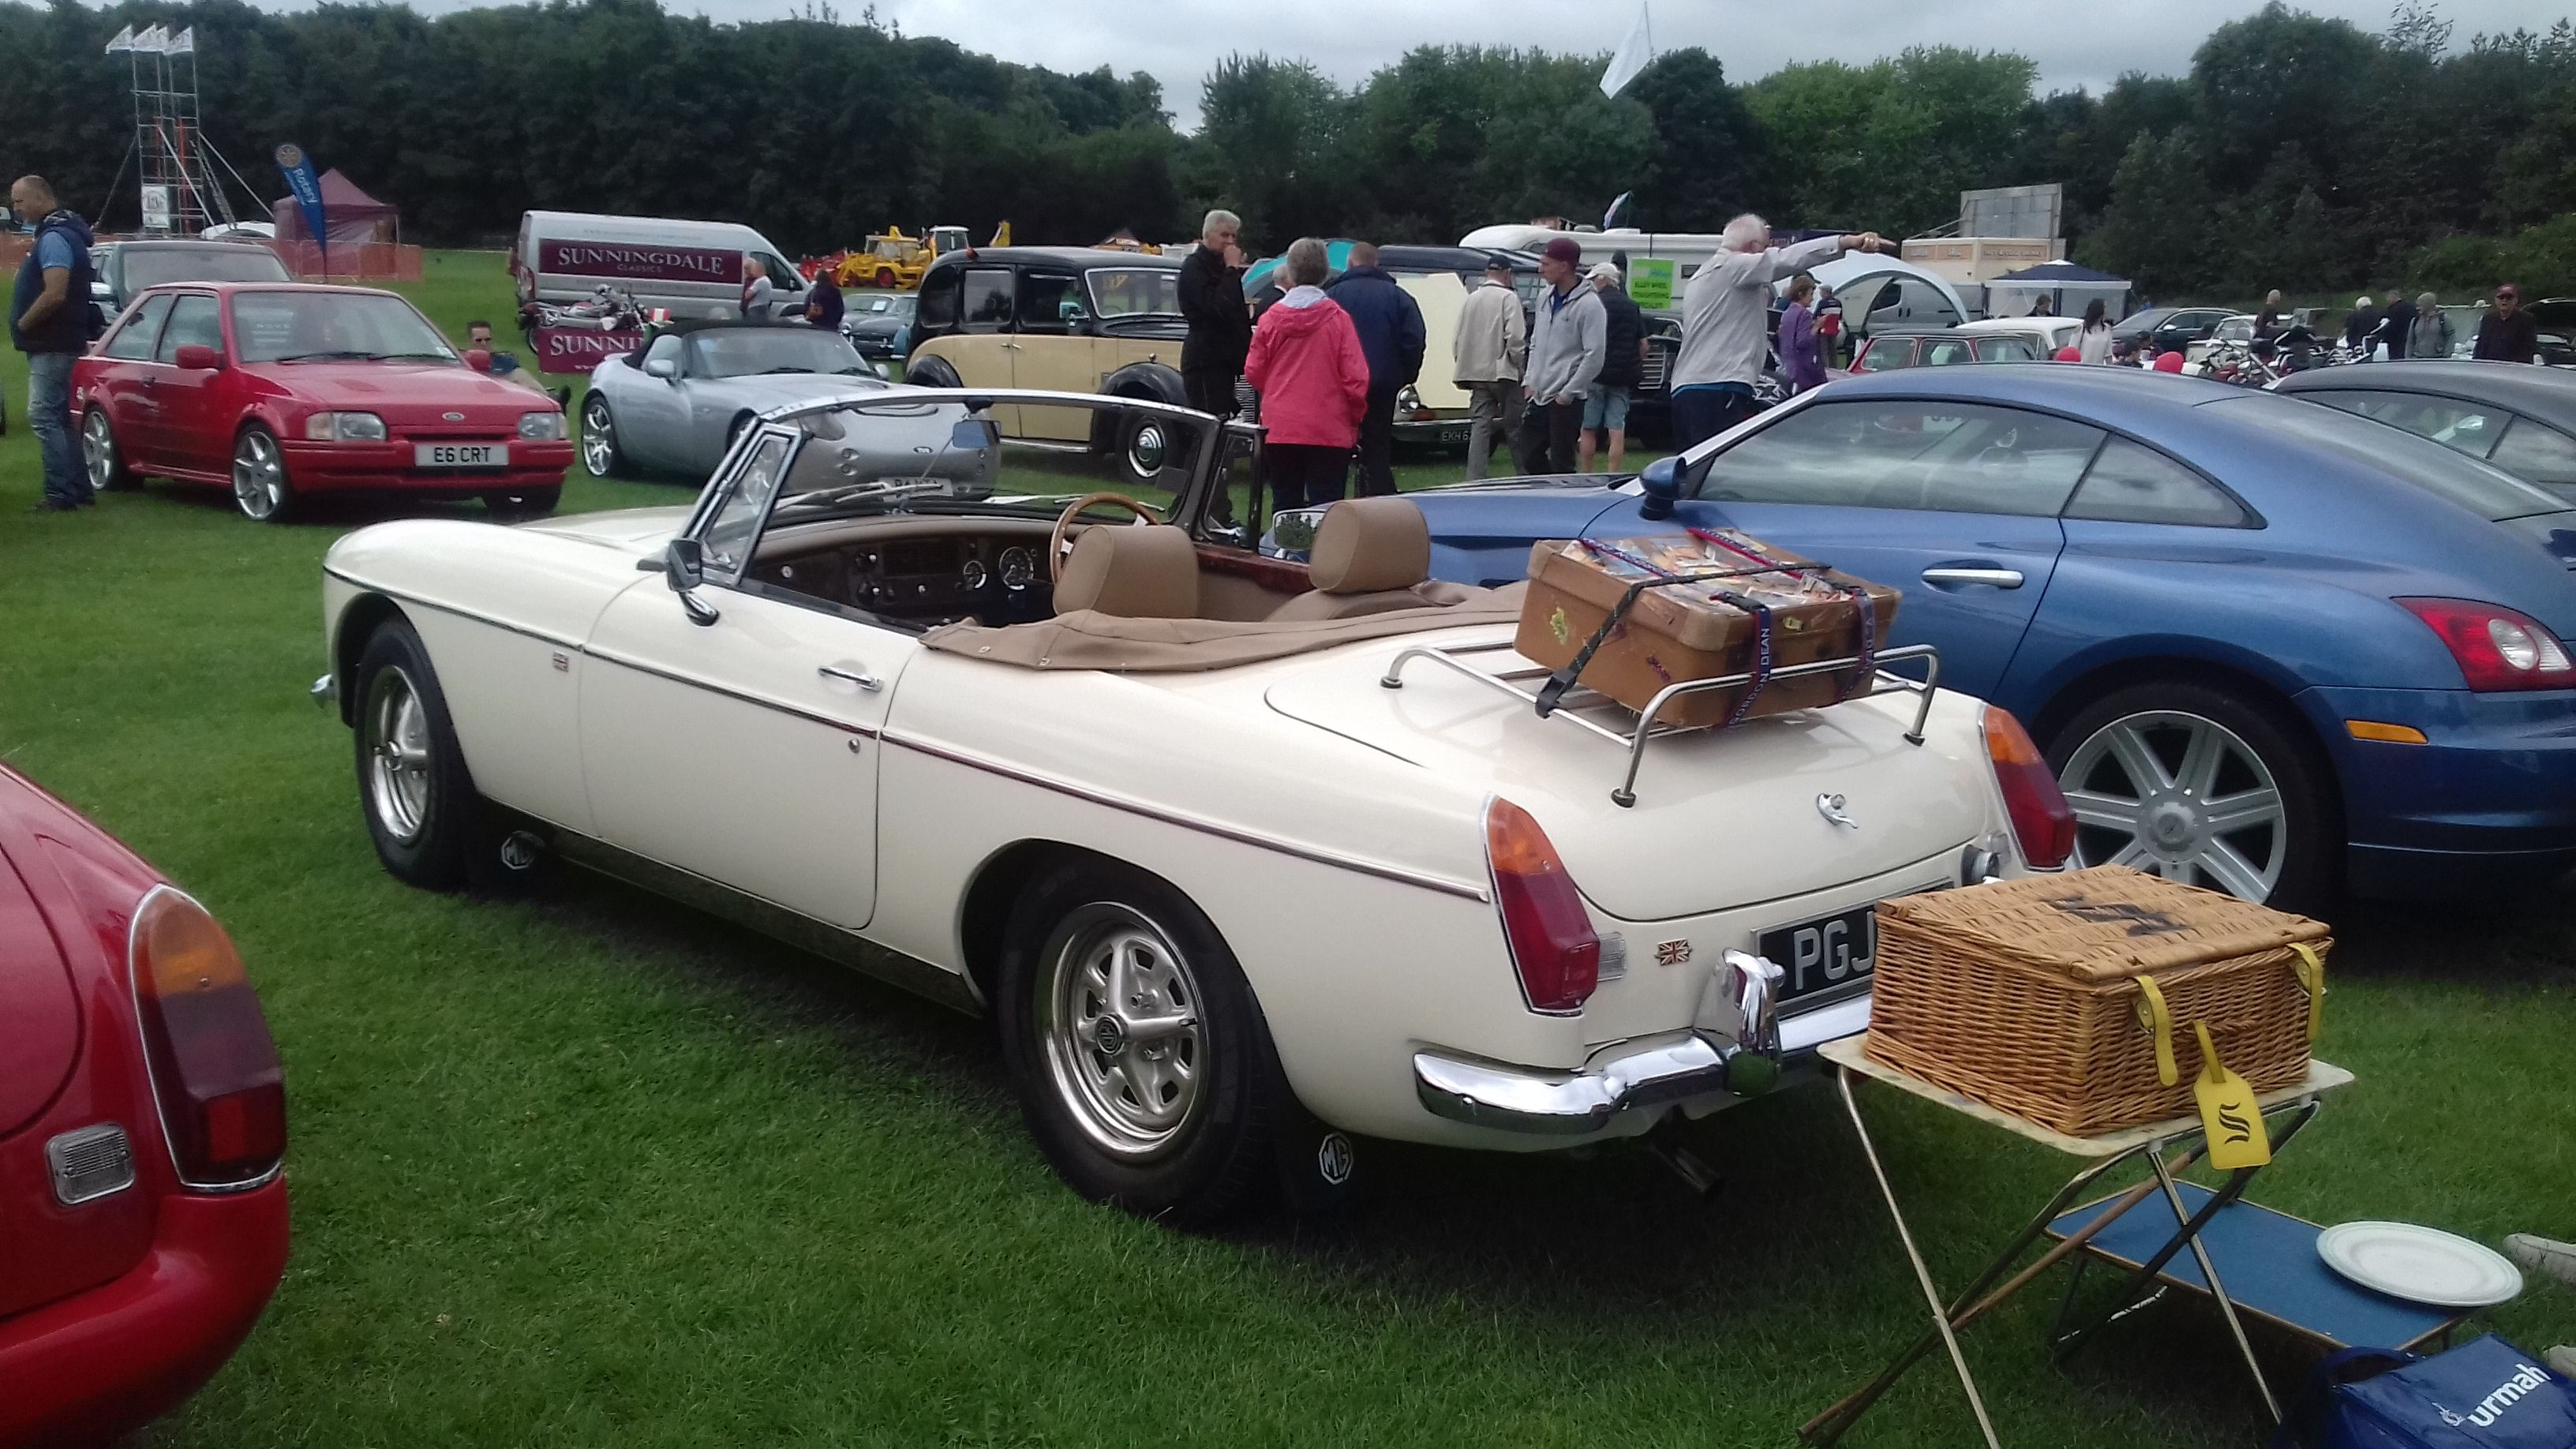 Pin By Tony Hamilton On Classics Cars Antique Cars Bmw Bmw Car